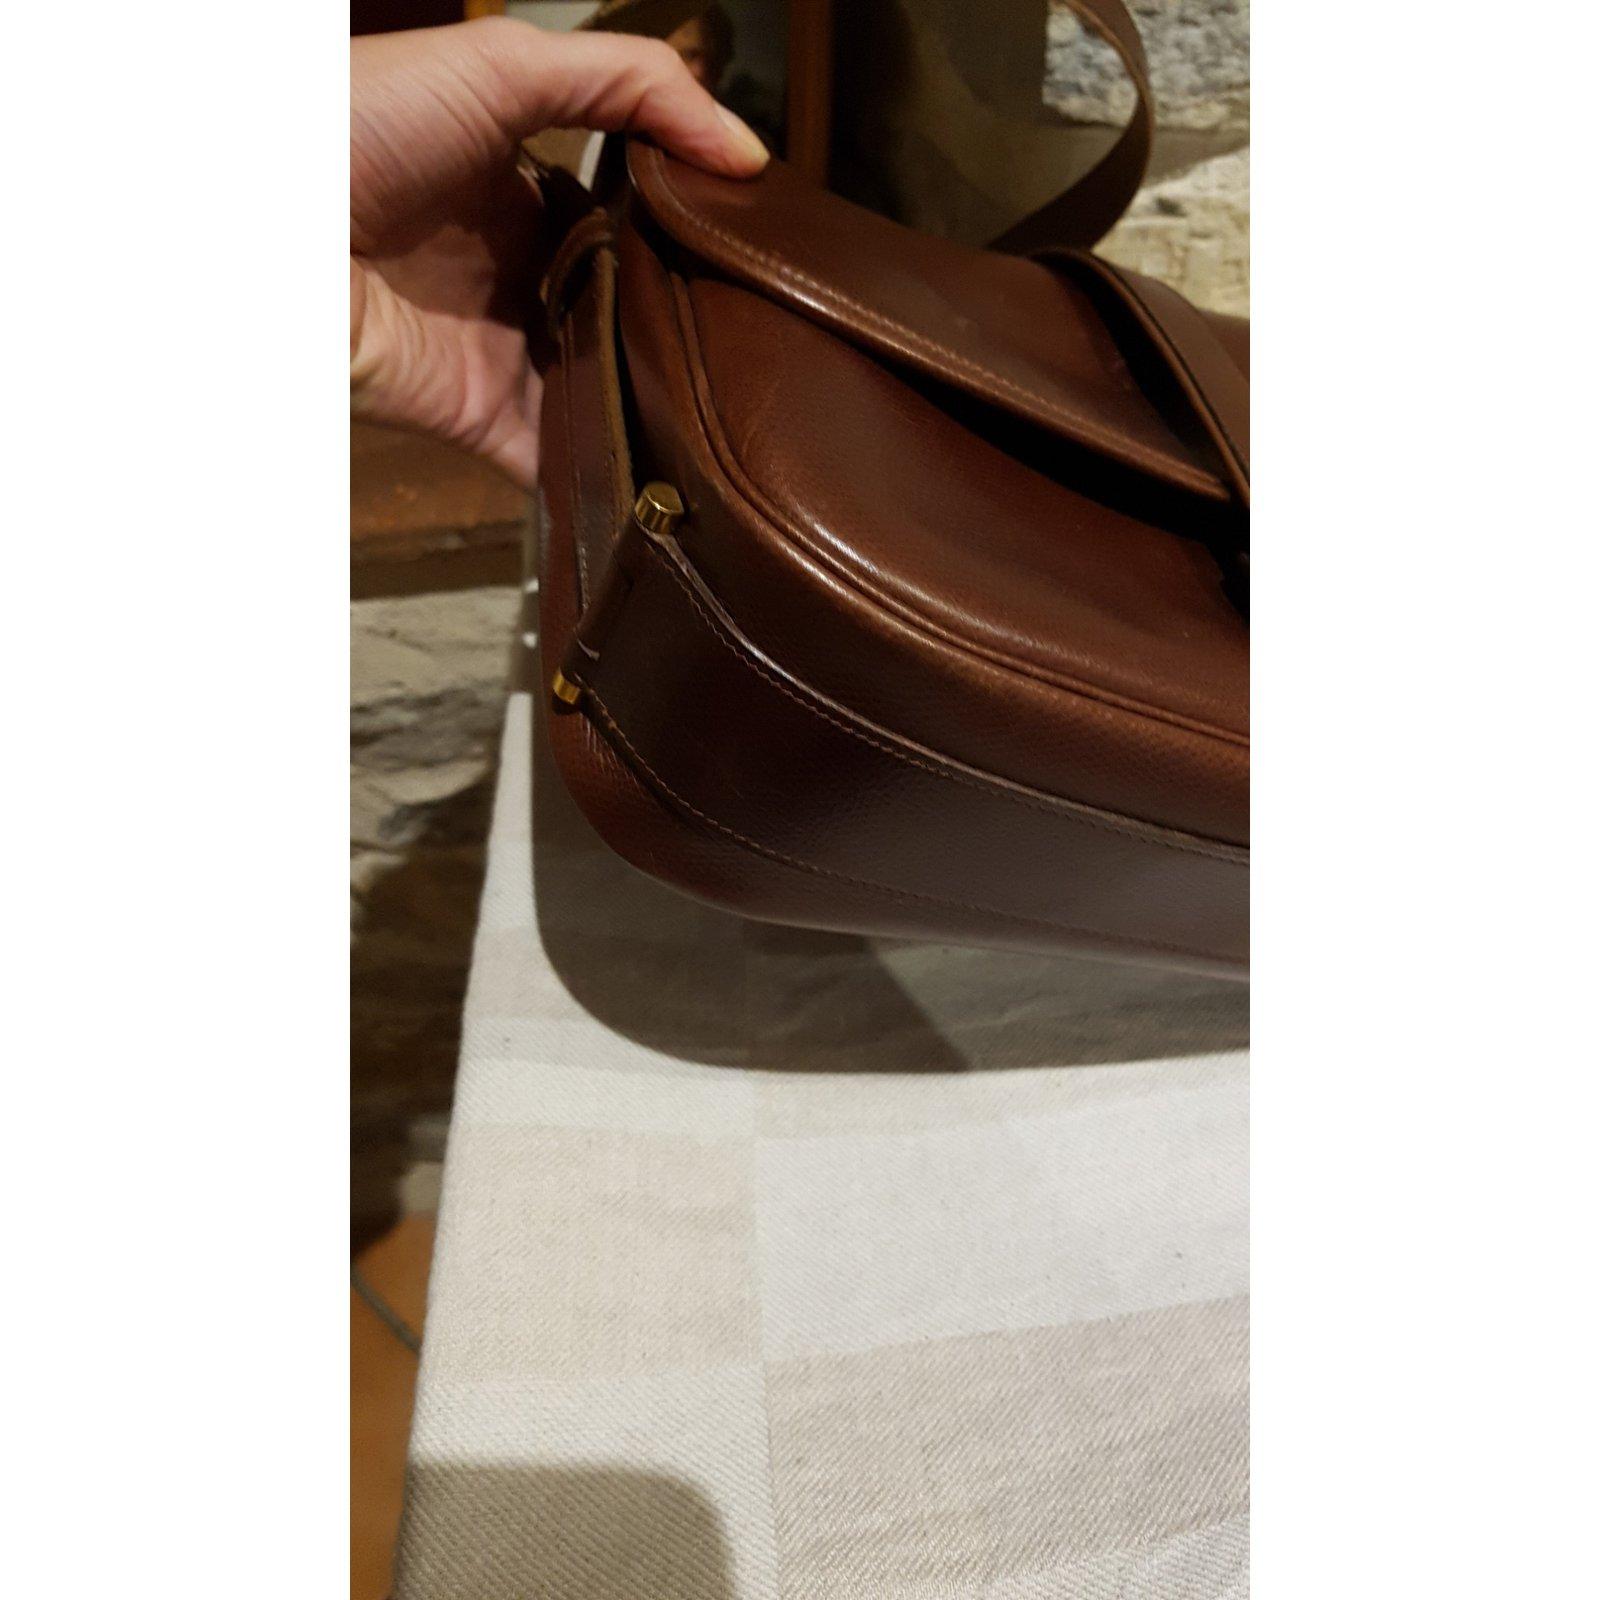 96594ca982e2 Facebook · Pin This. Hermès Nouméa leather bag courchevel chocolate  Handbags Leather Brown ...